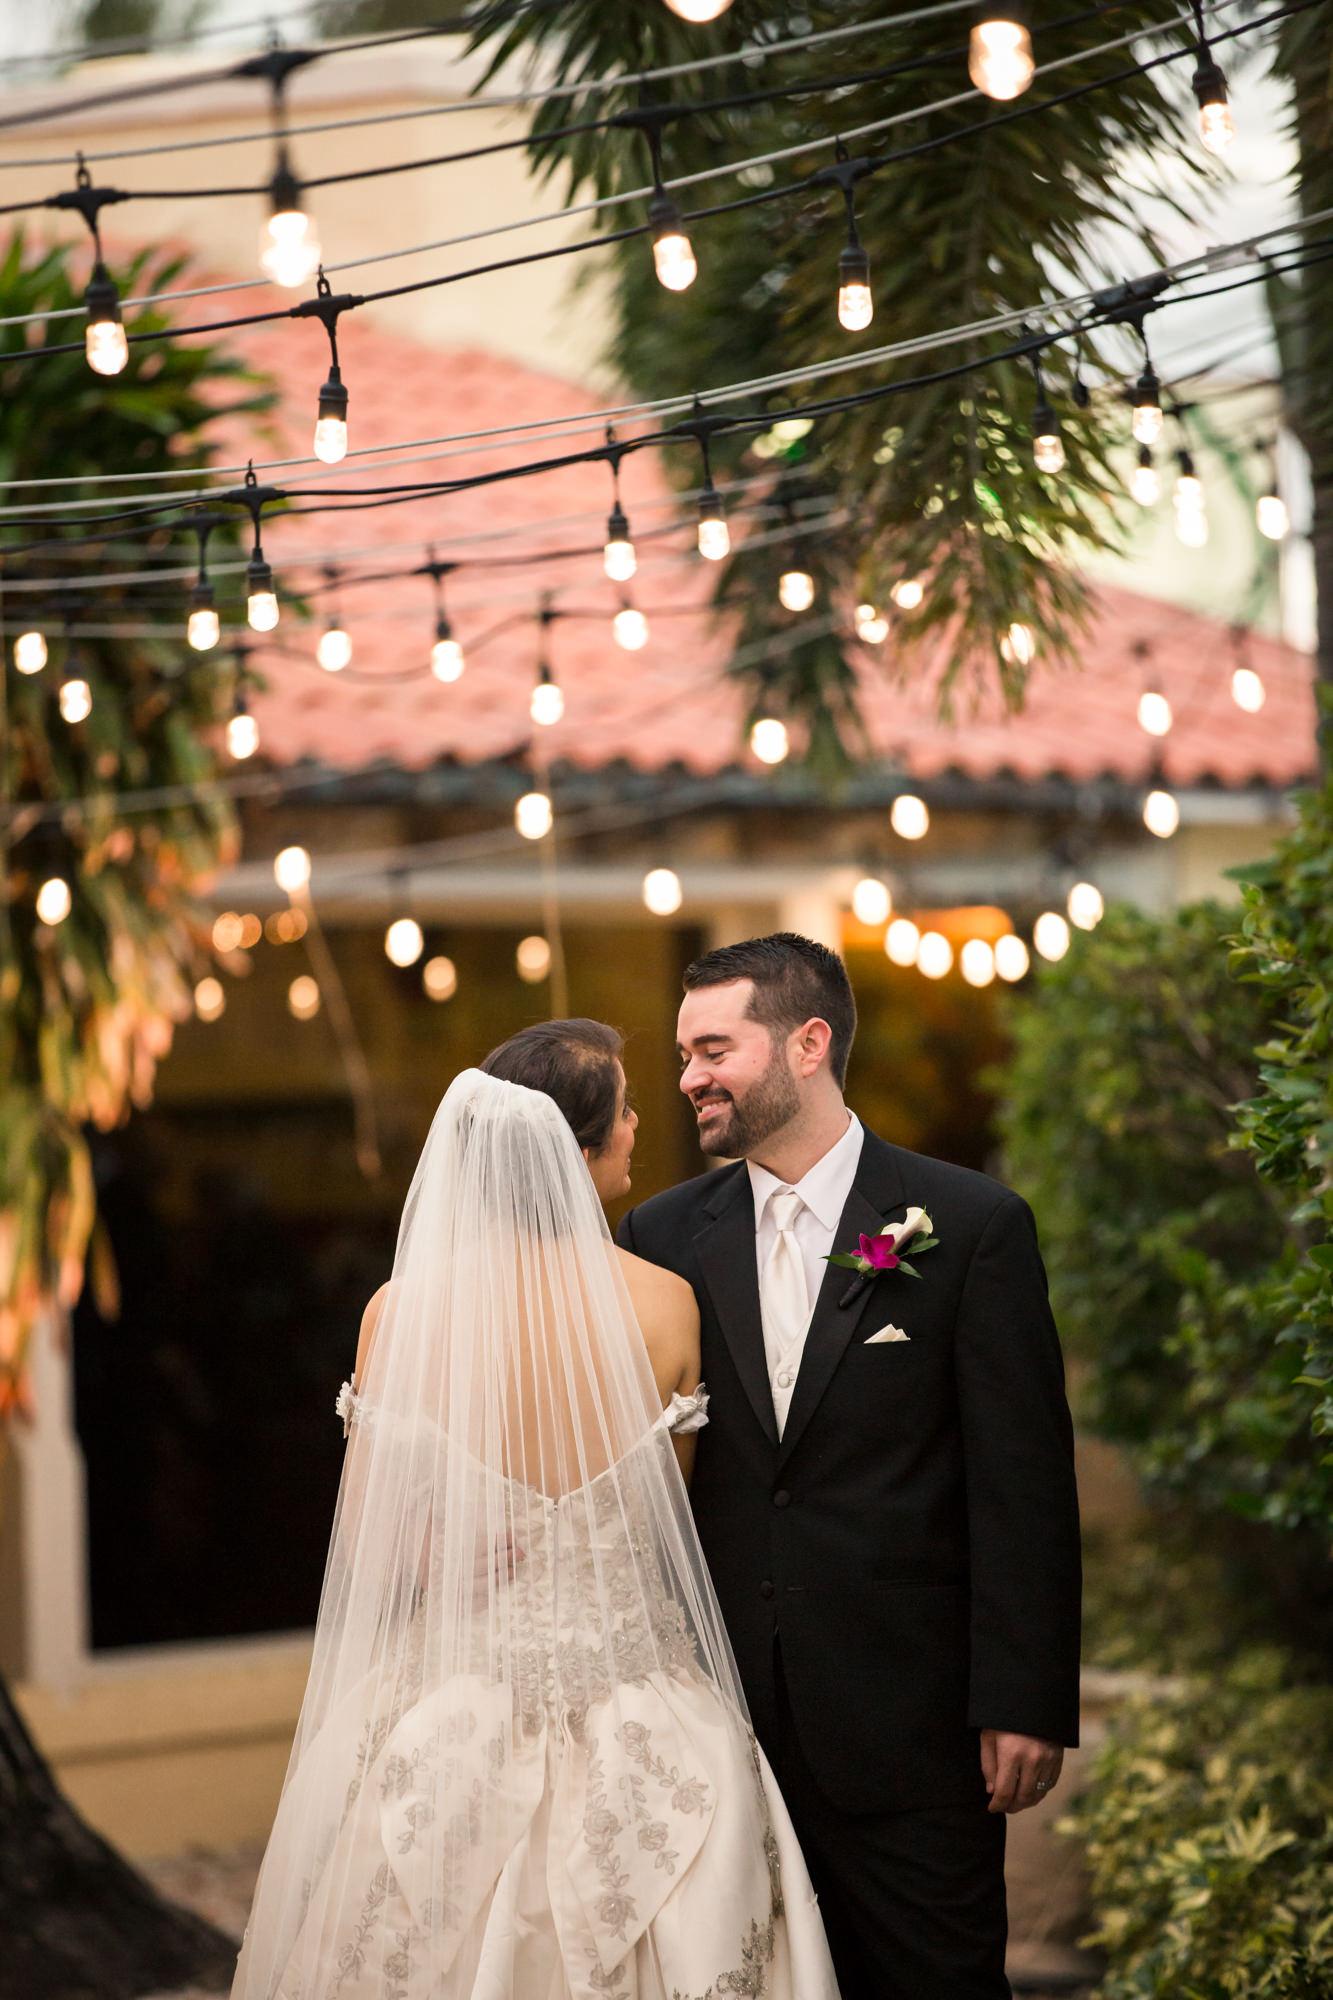 Benvenuto_Wedding_catholic_Florida_Bride-Groom-94.jpg